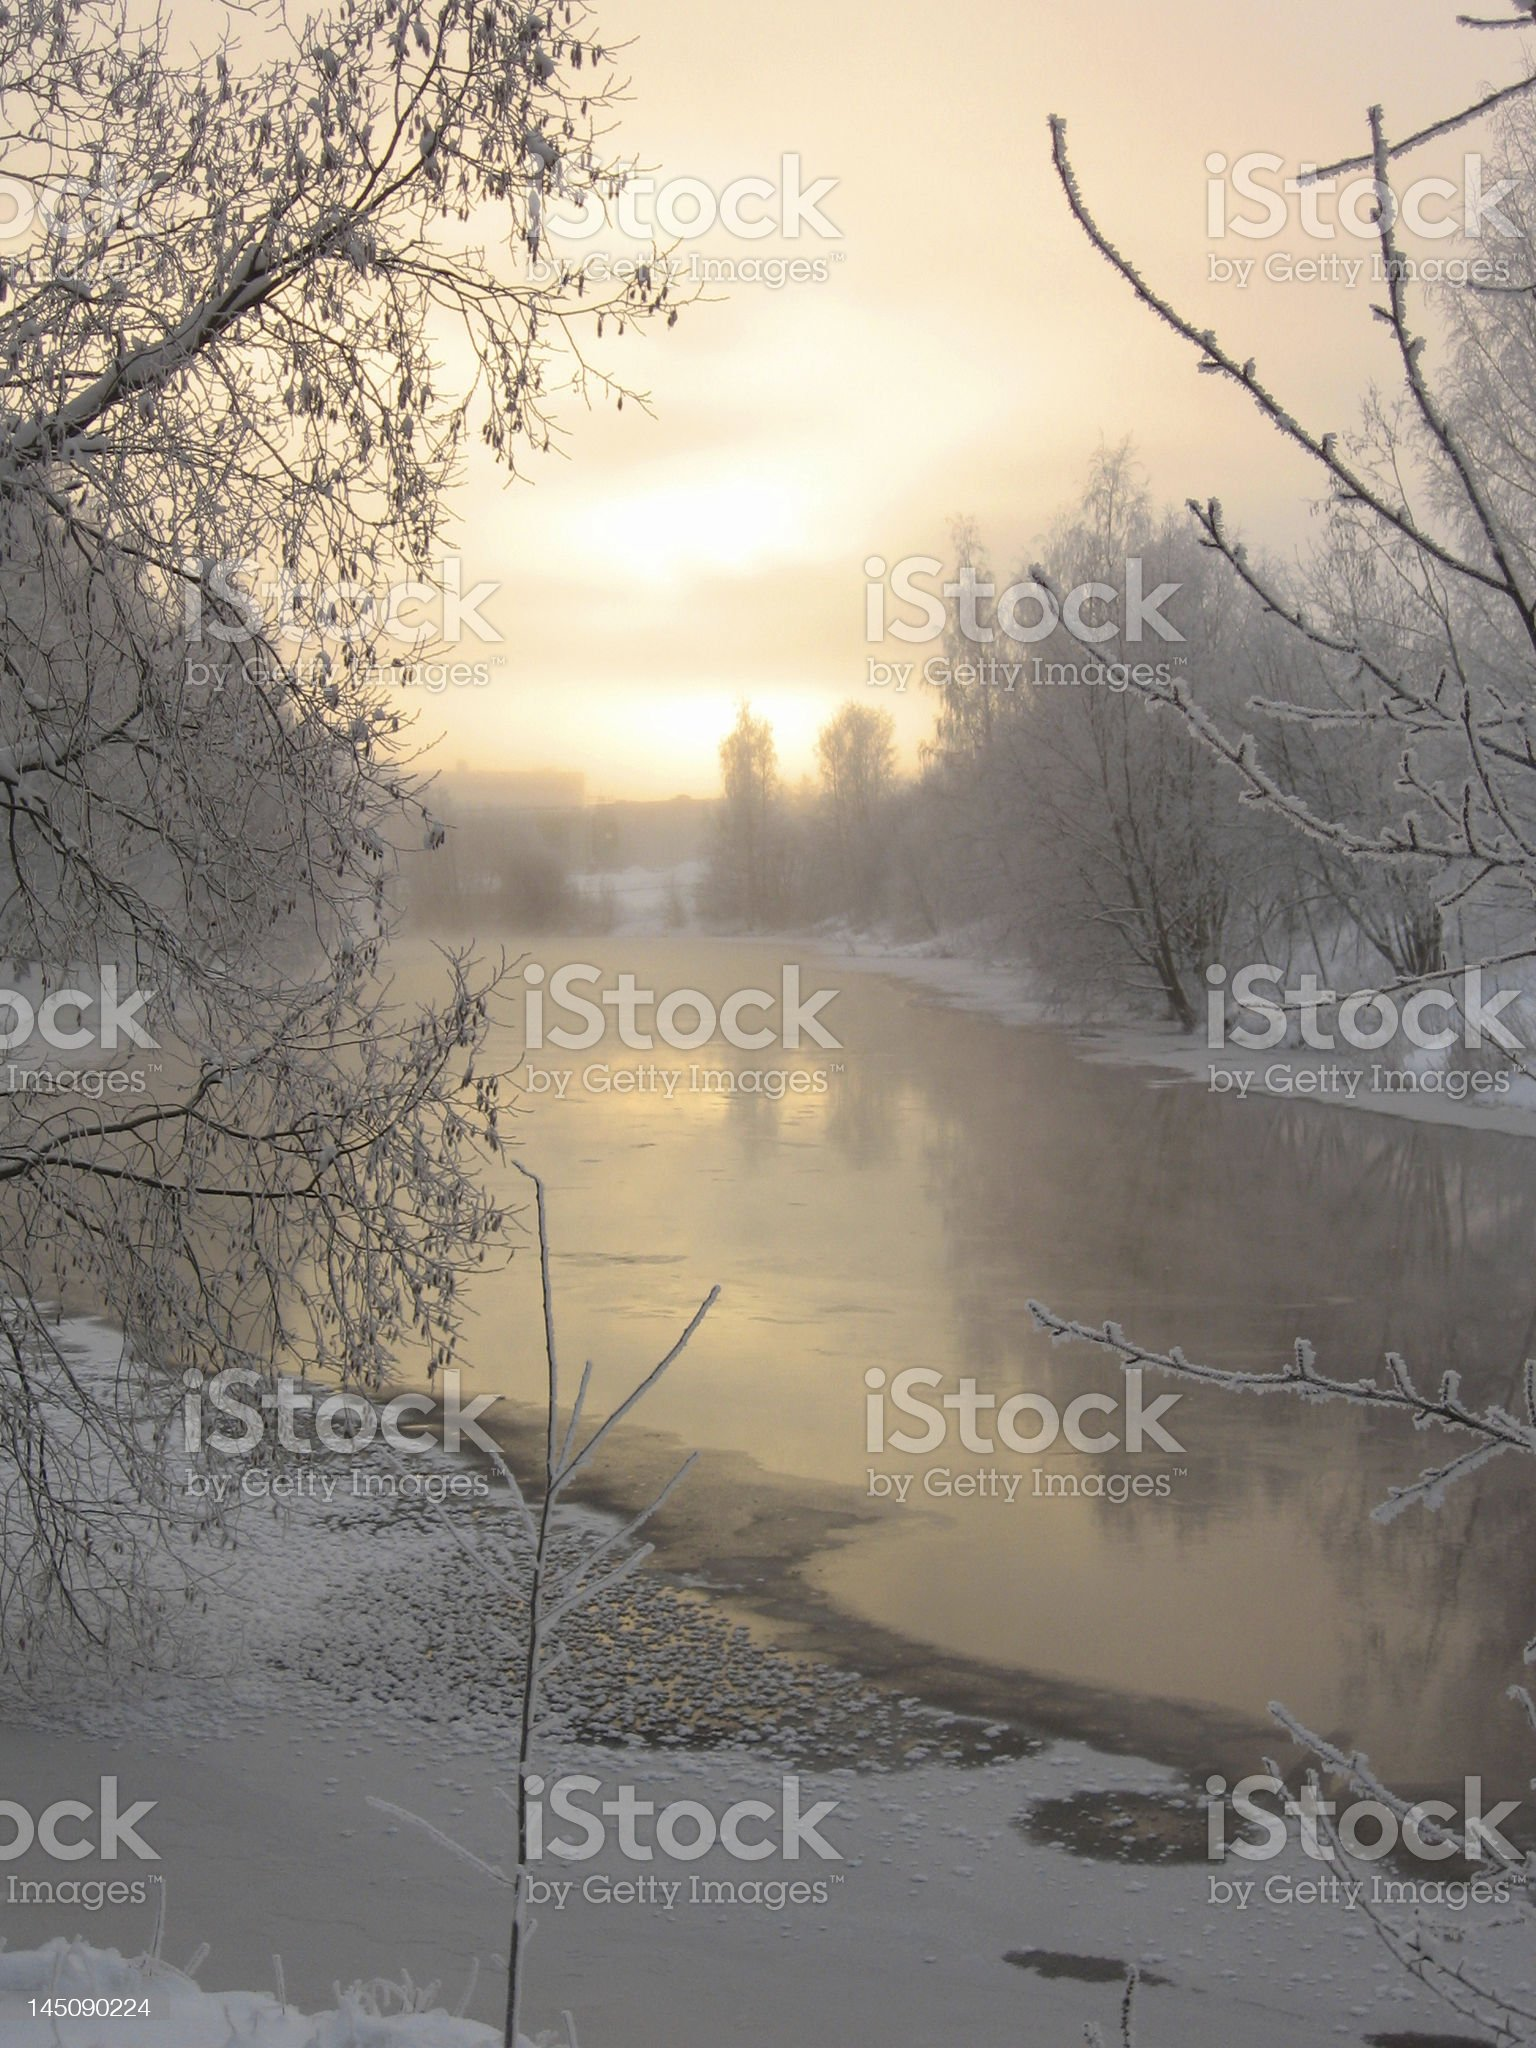 Winter scenery royalty-free stock photo